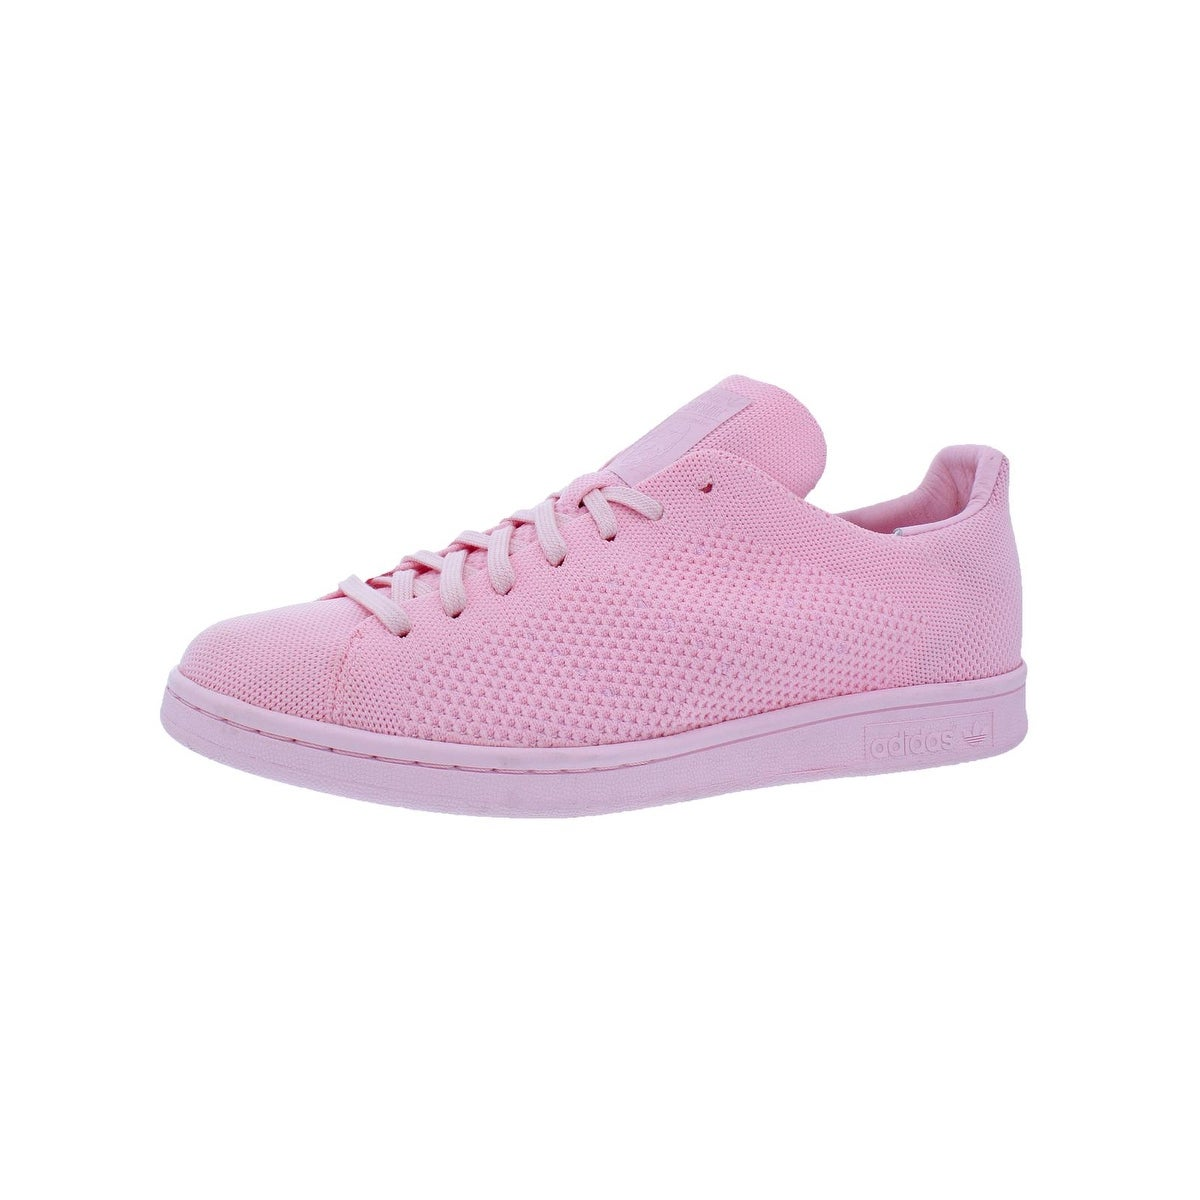 free shipping dd03e e96ae Adidas Mens Stan Smith Primeknit Fashion Sneakers Low-Top Round Toe - 9  medium (d)